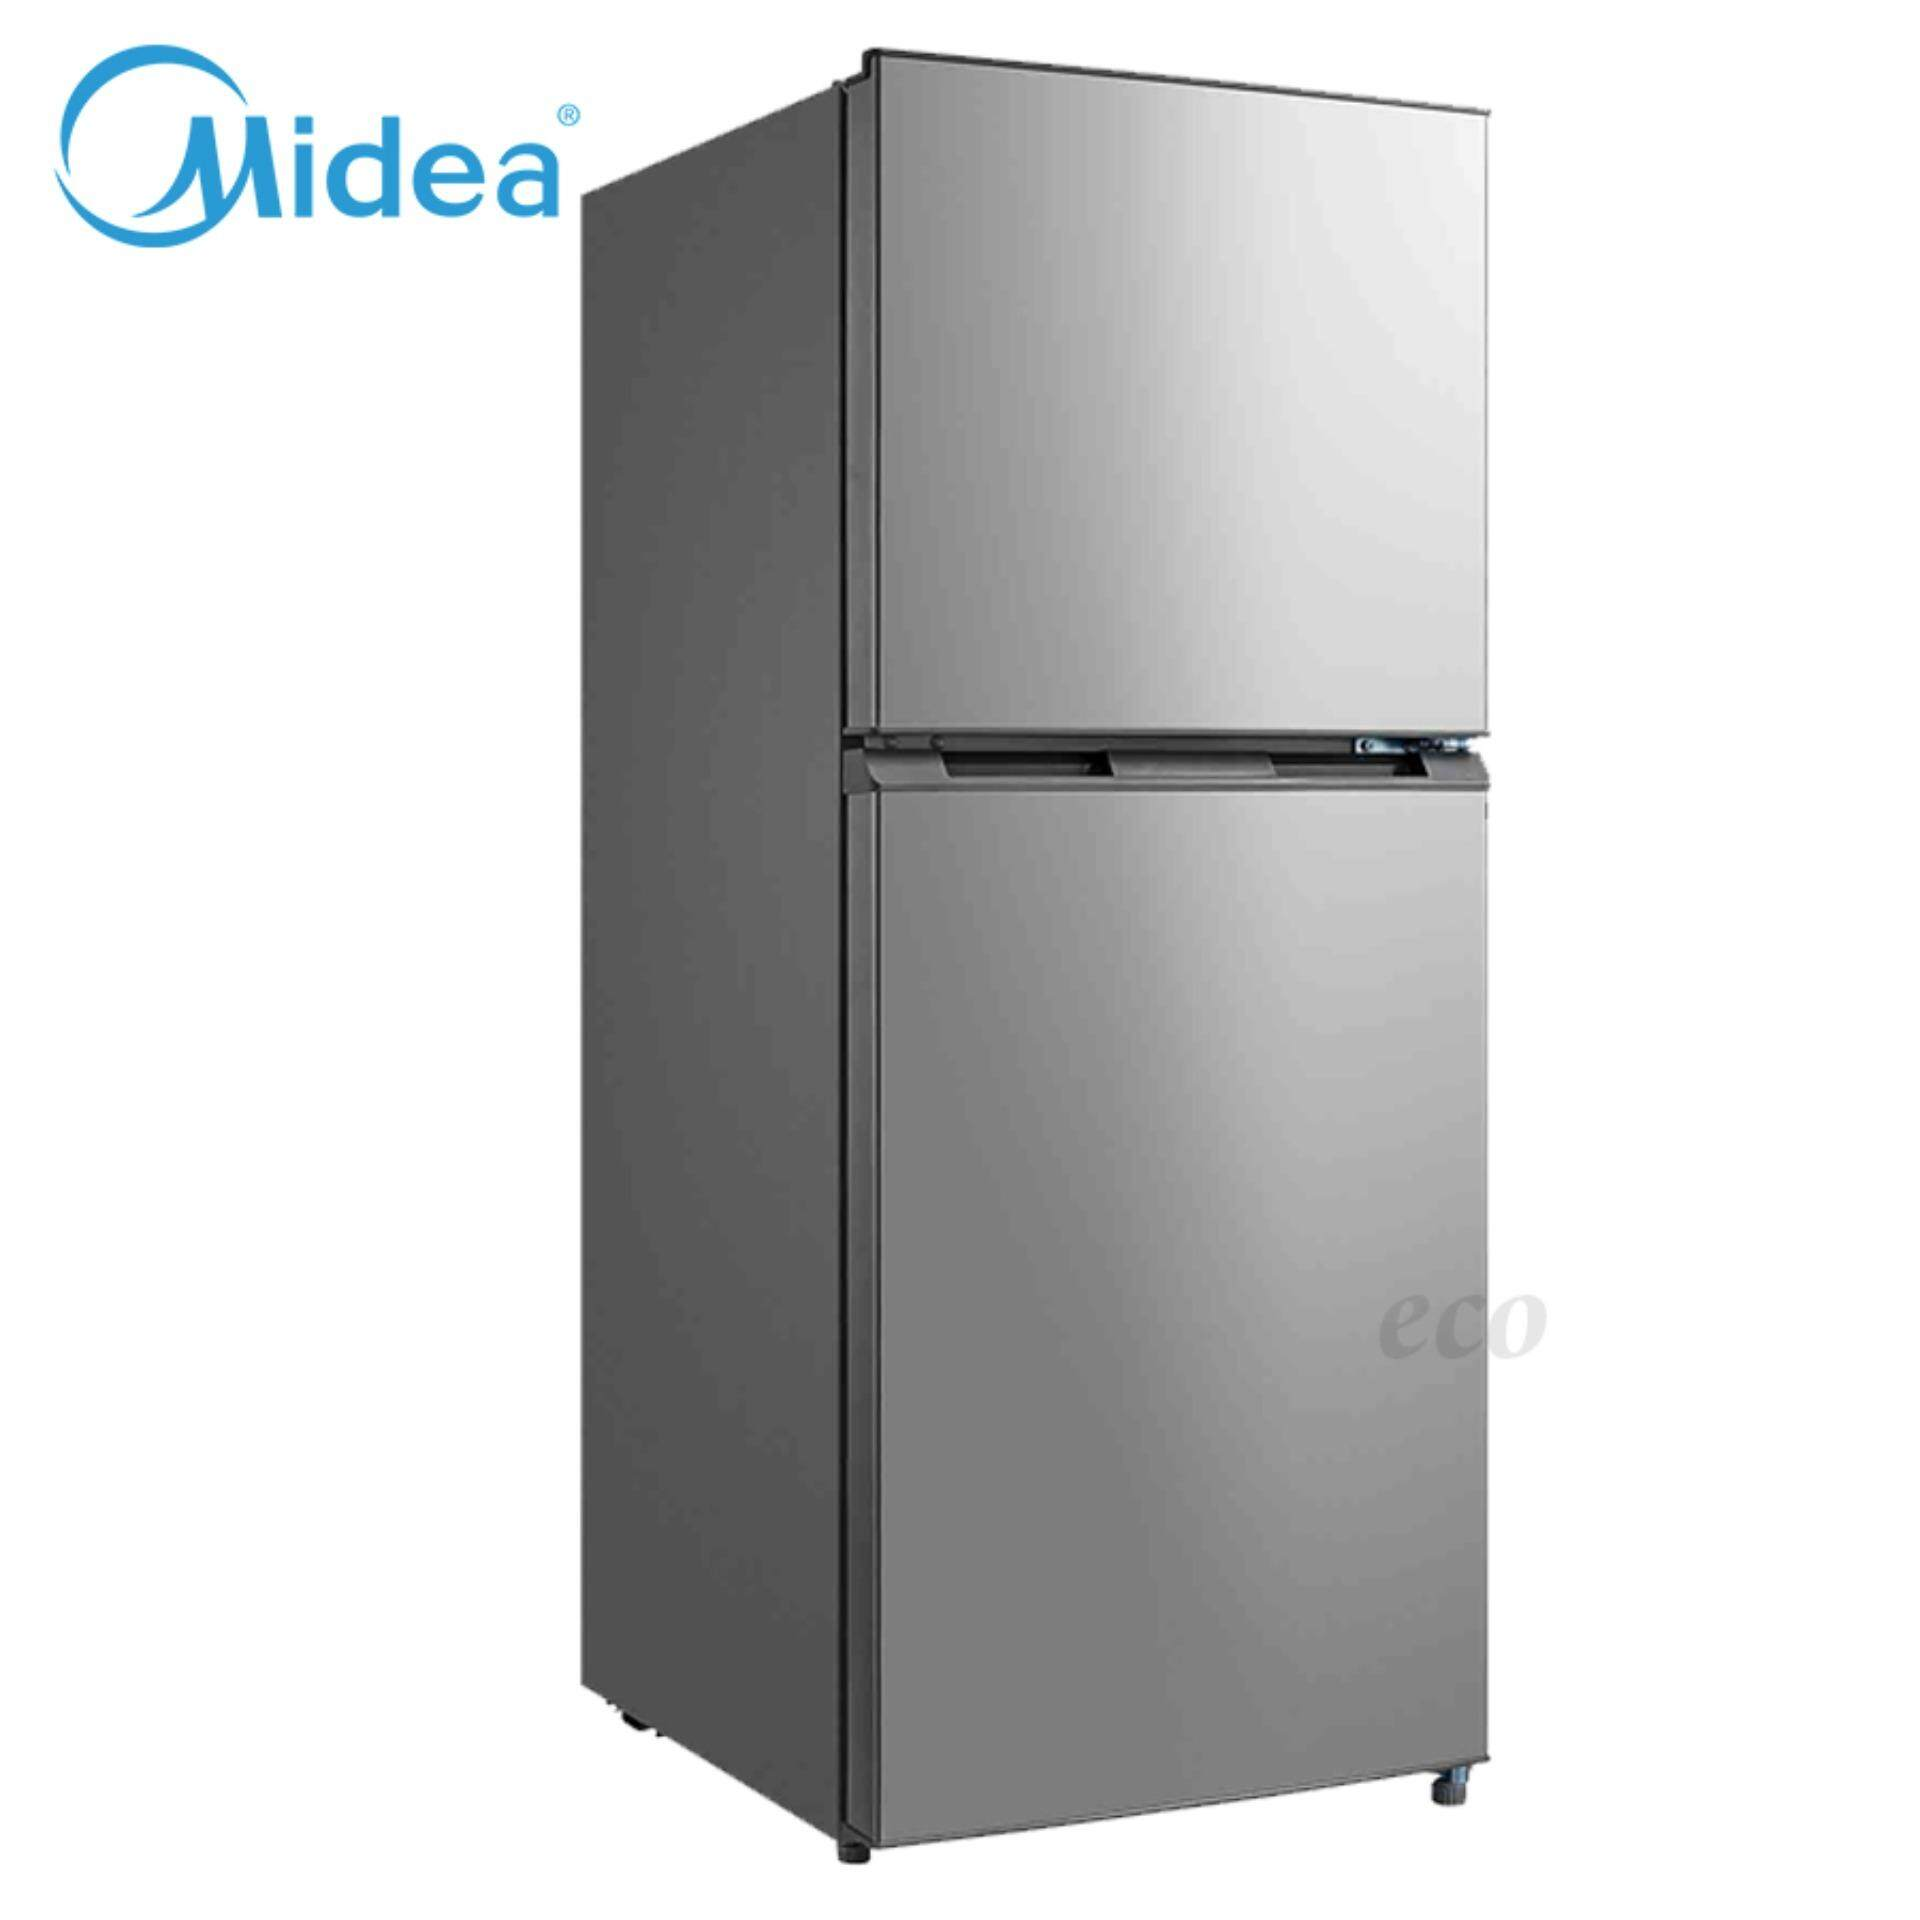 Midea MD-212 Frost Free 2 door Refrigerator 192Litre